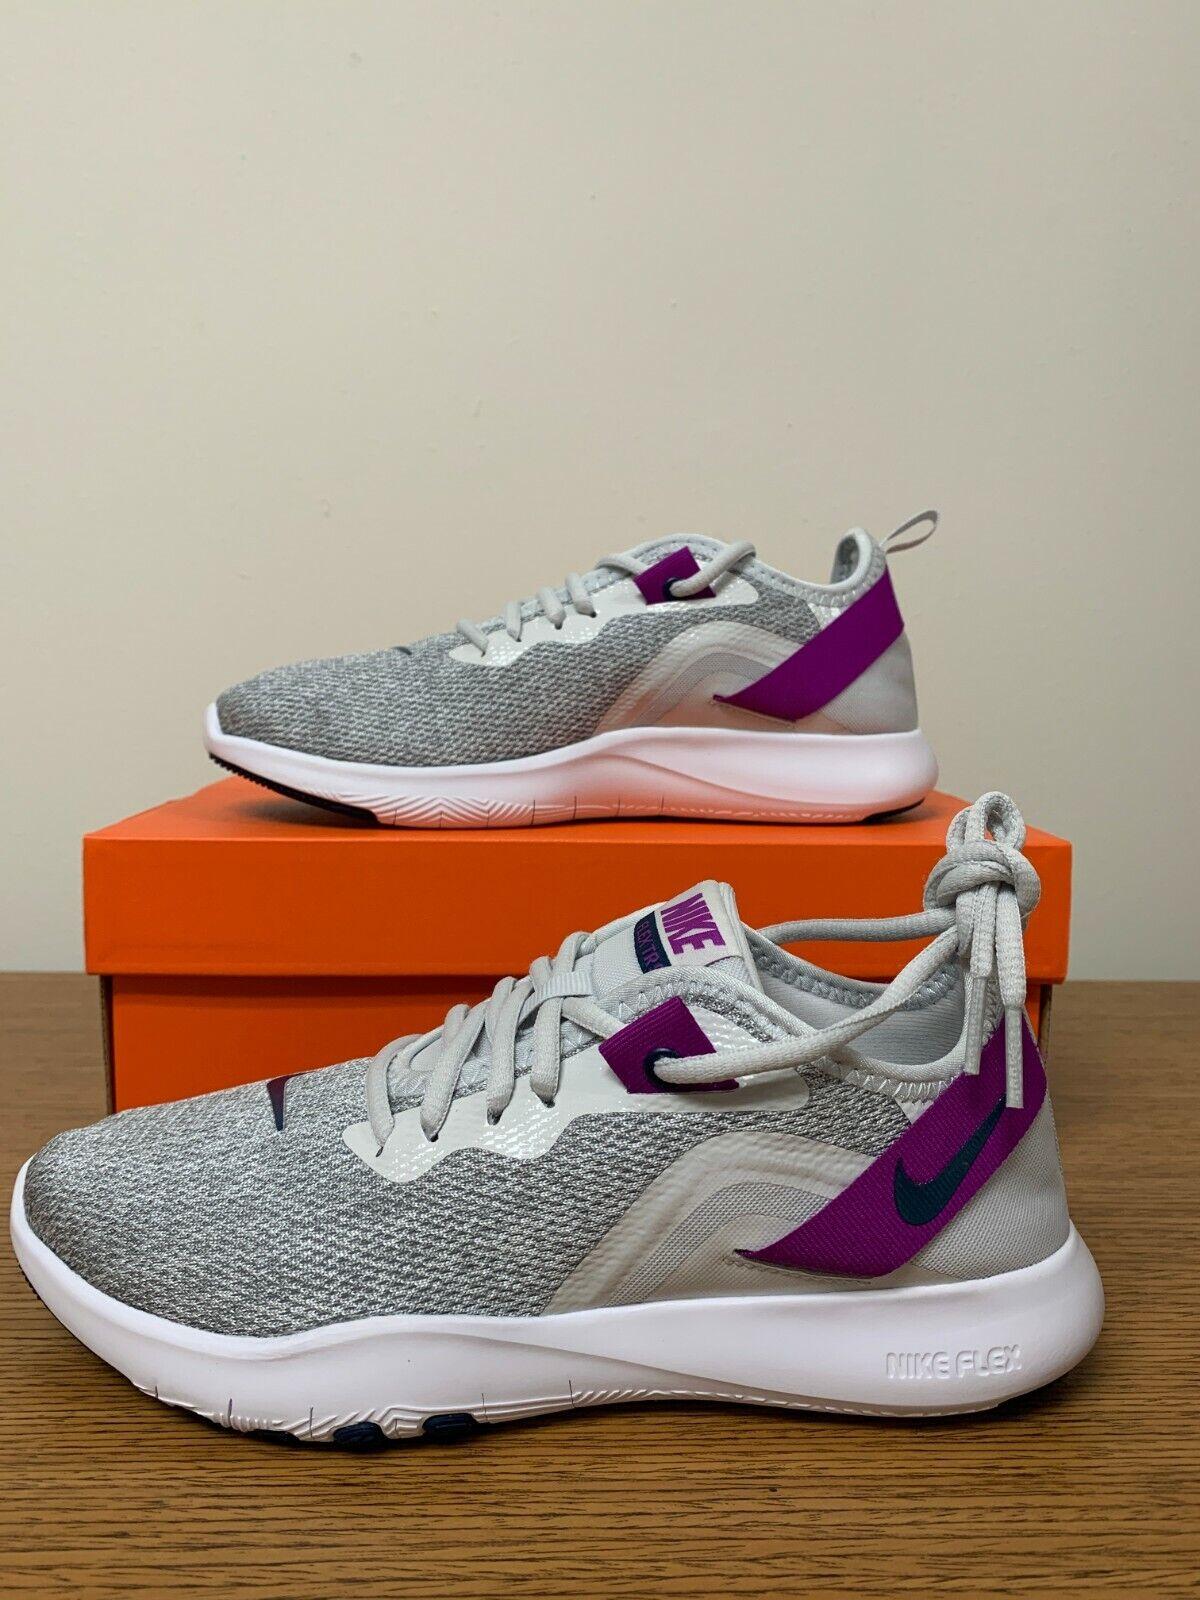 Nike Women's Flex Trainer 9 Cross Training Shoes Gray Purple AQ7491-009 NEW